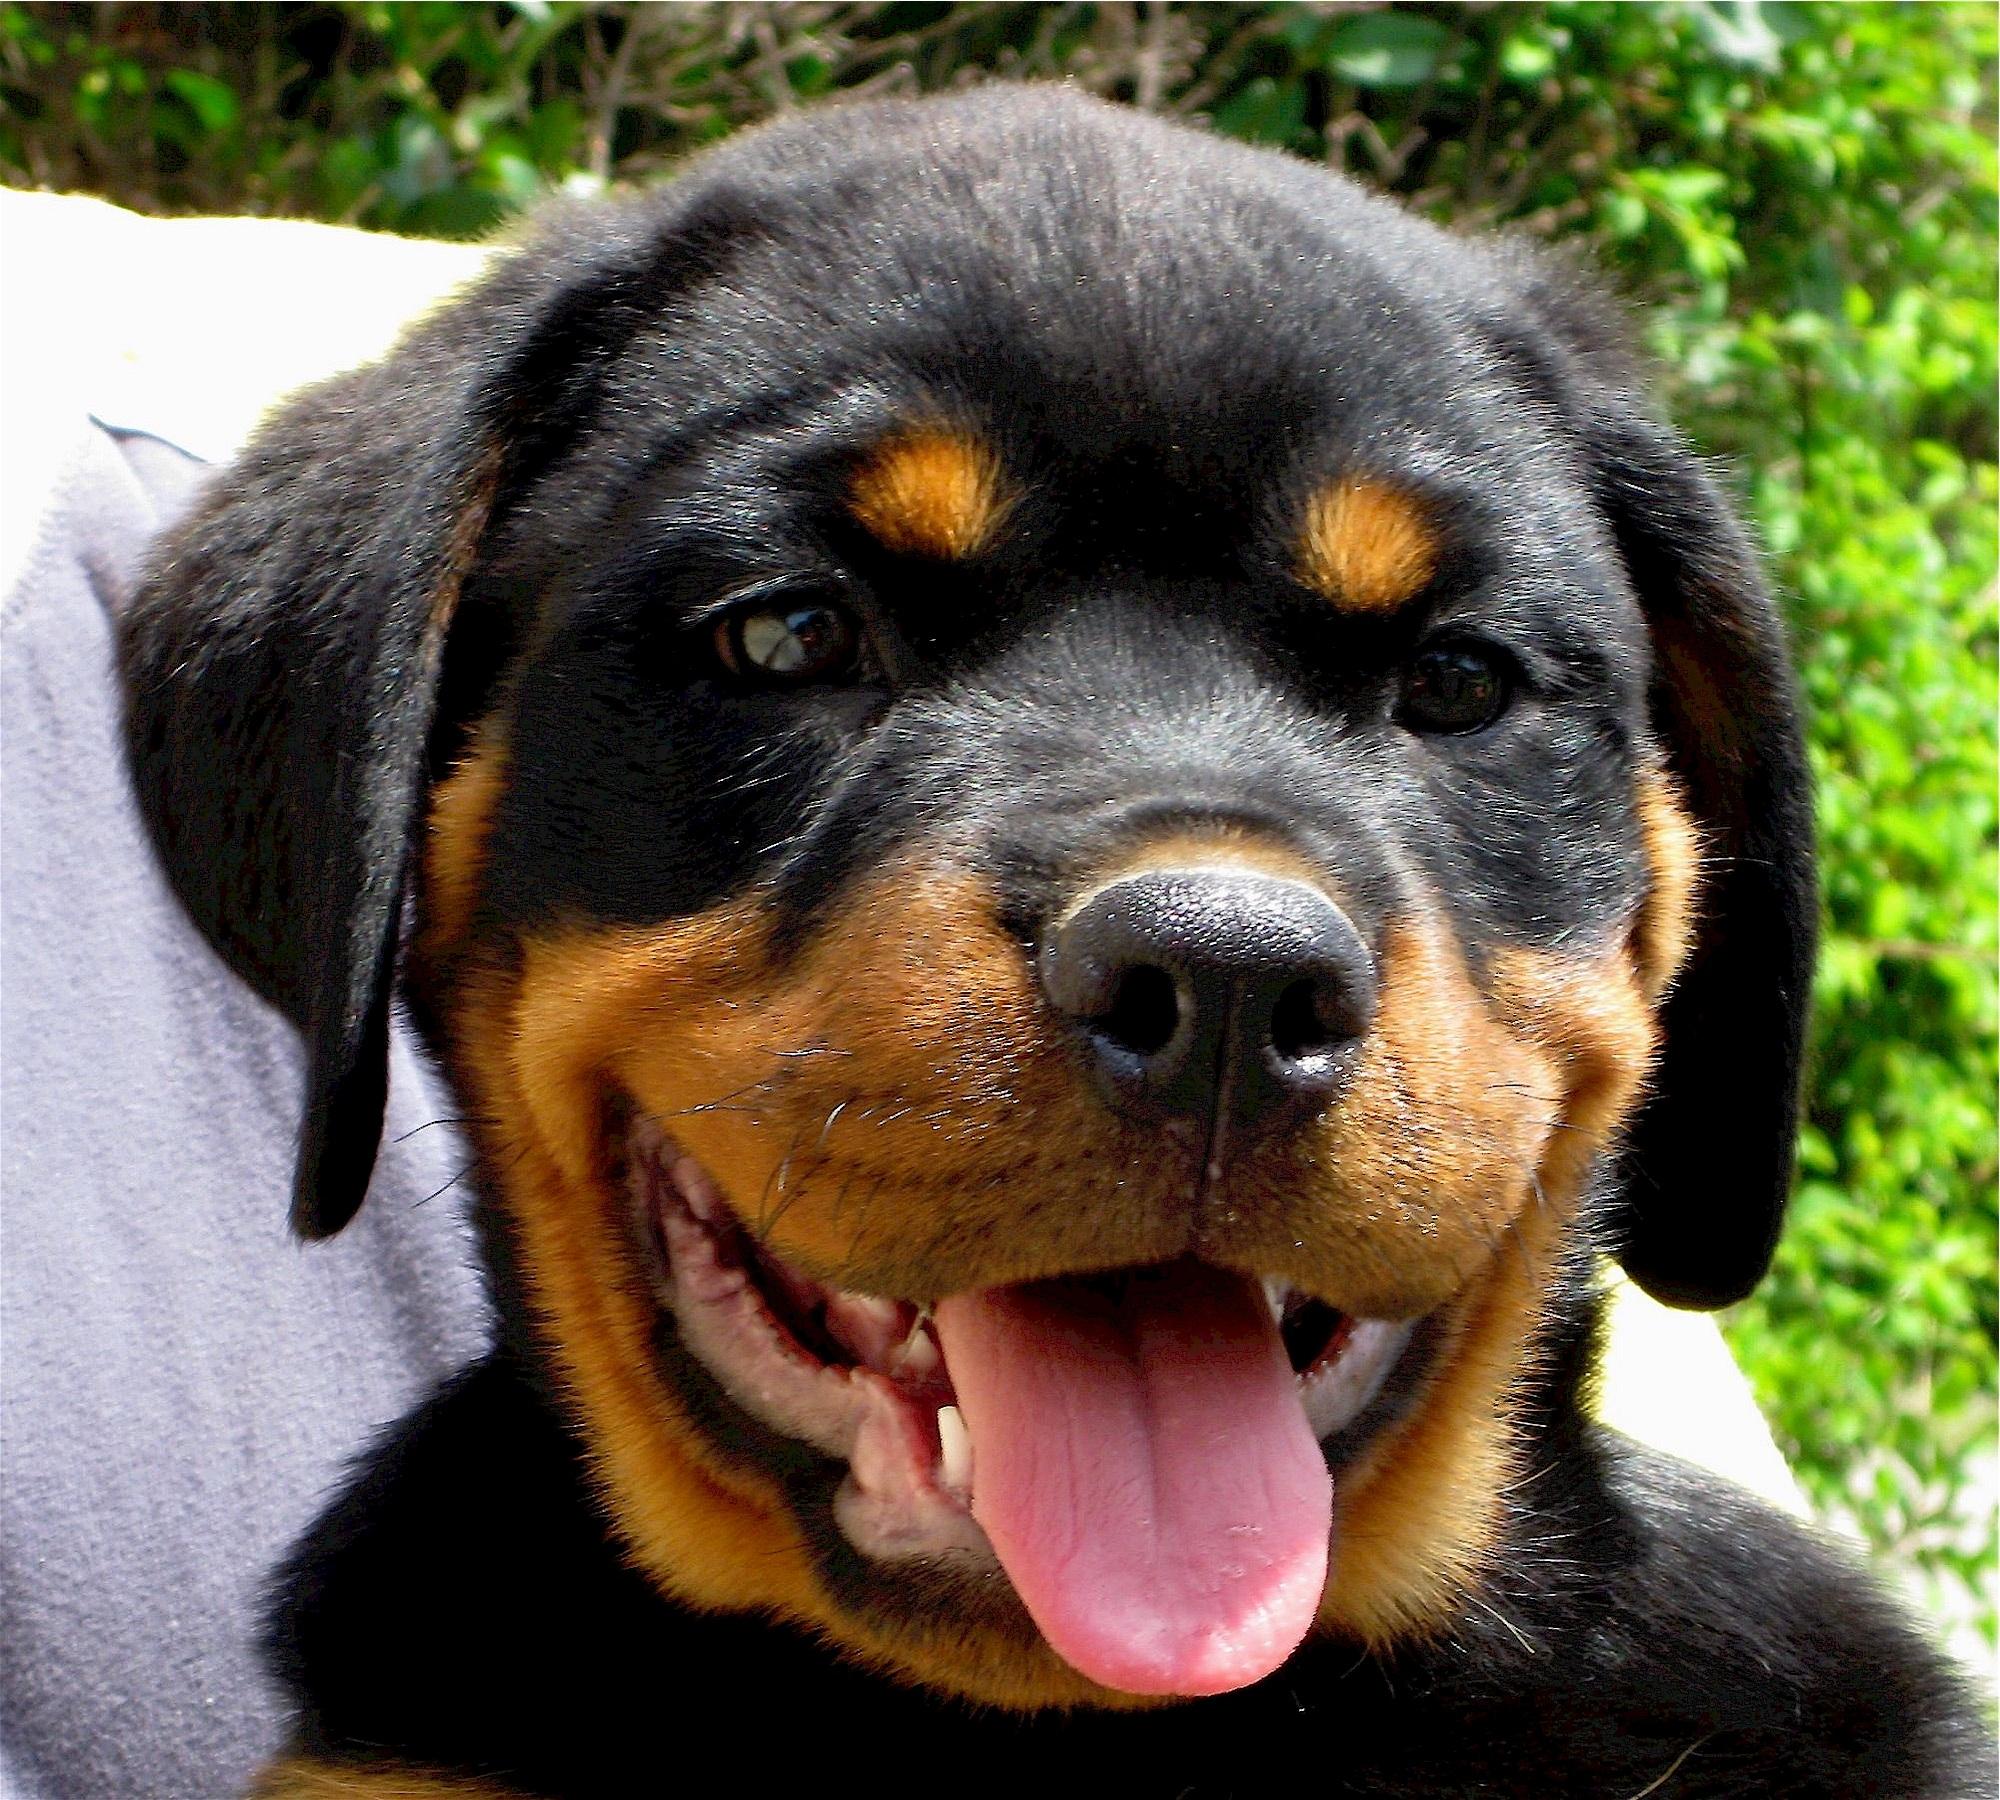 Rottweiler, Animal, Dog, Free dog photos, Friend, HQ Photo